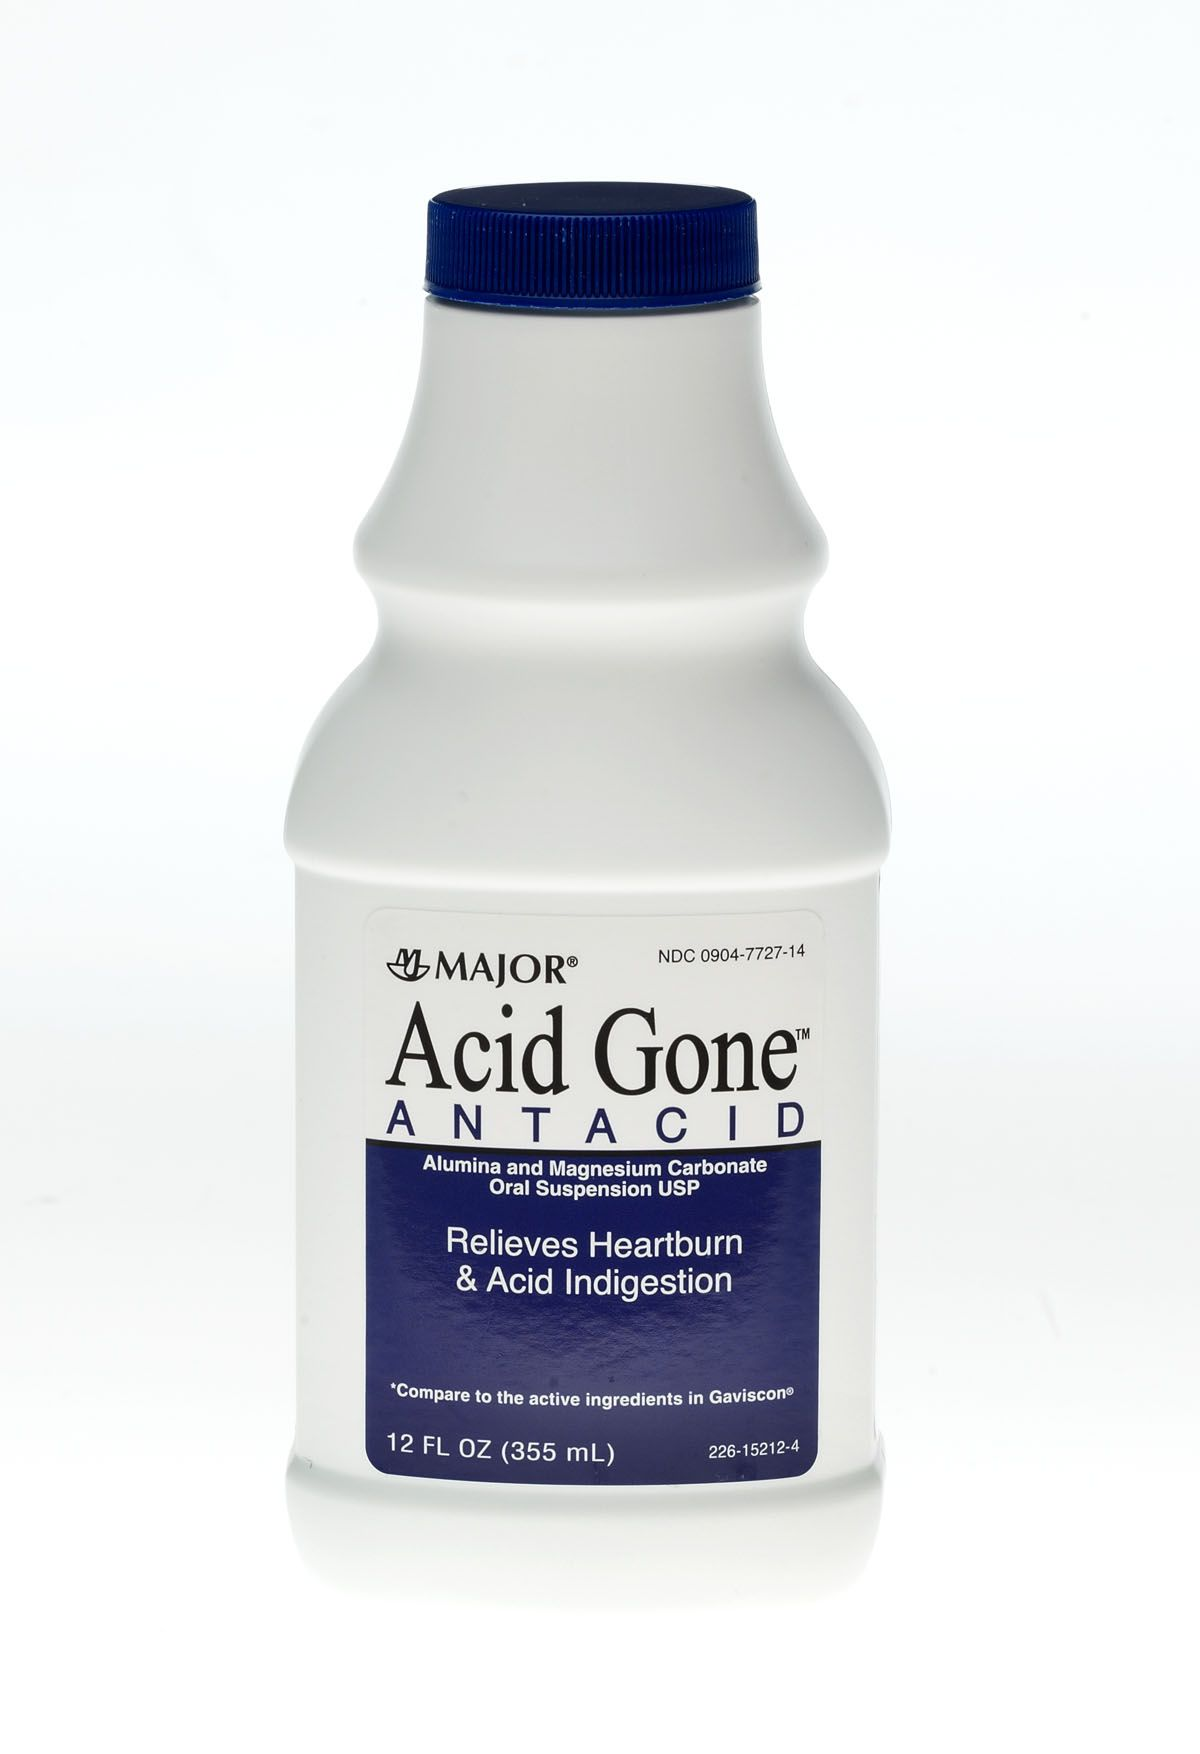 Acid Gone Antacid Liquid 12 oz By Major Pharma Gen Gaviscon